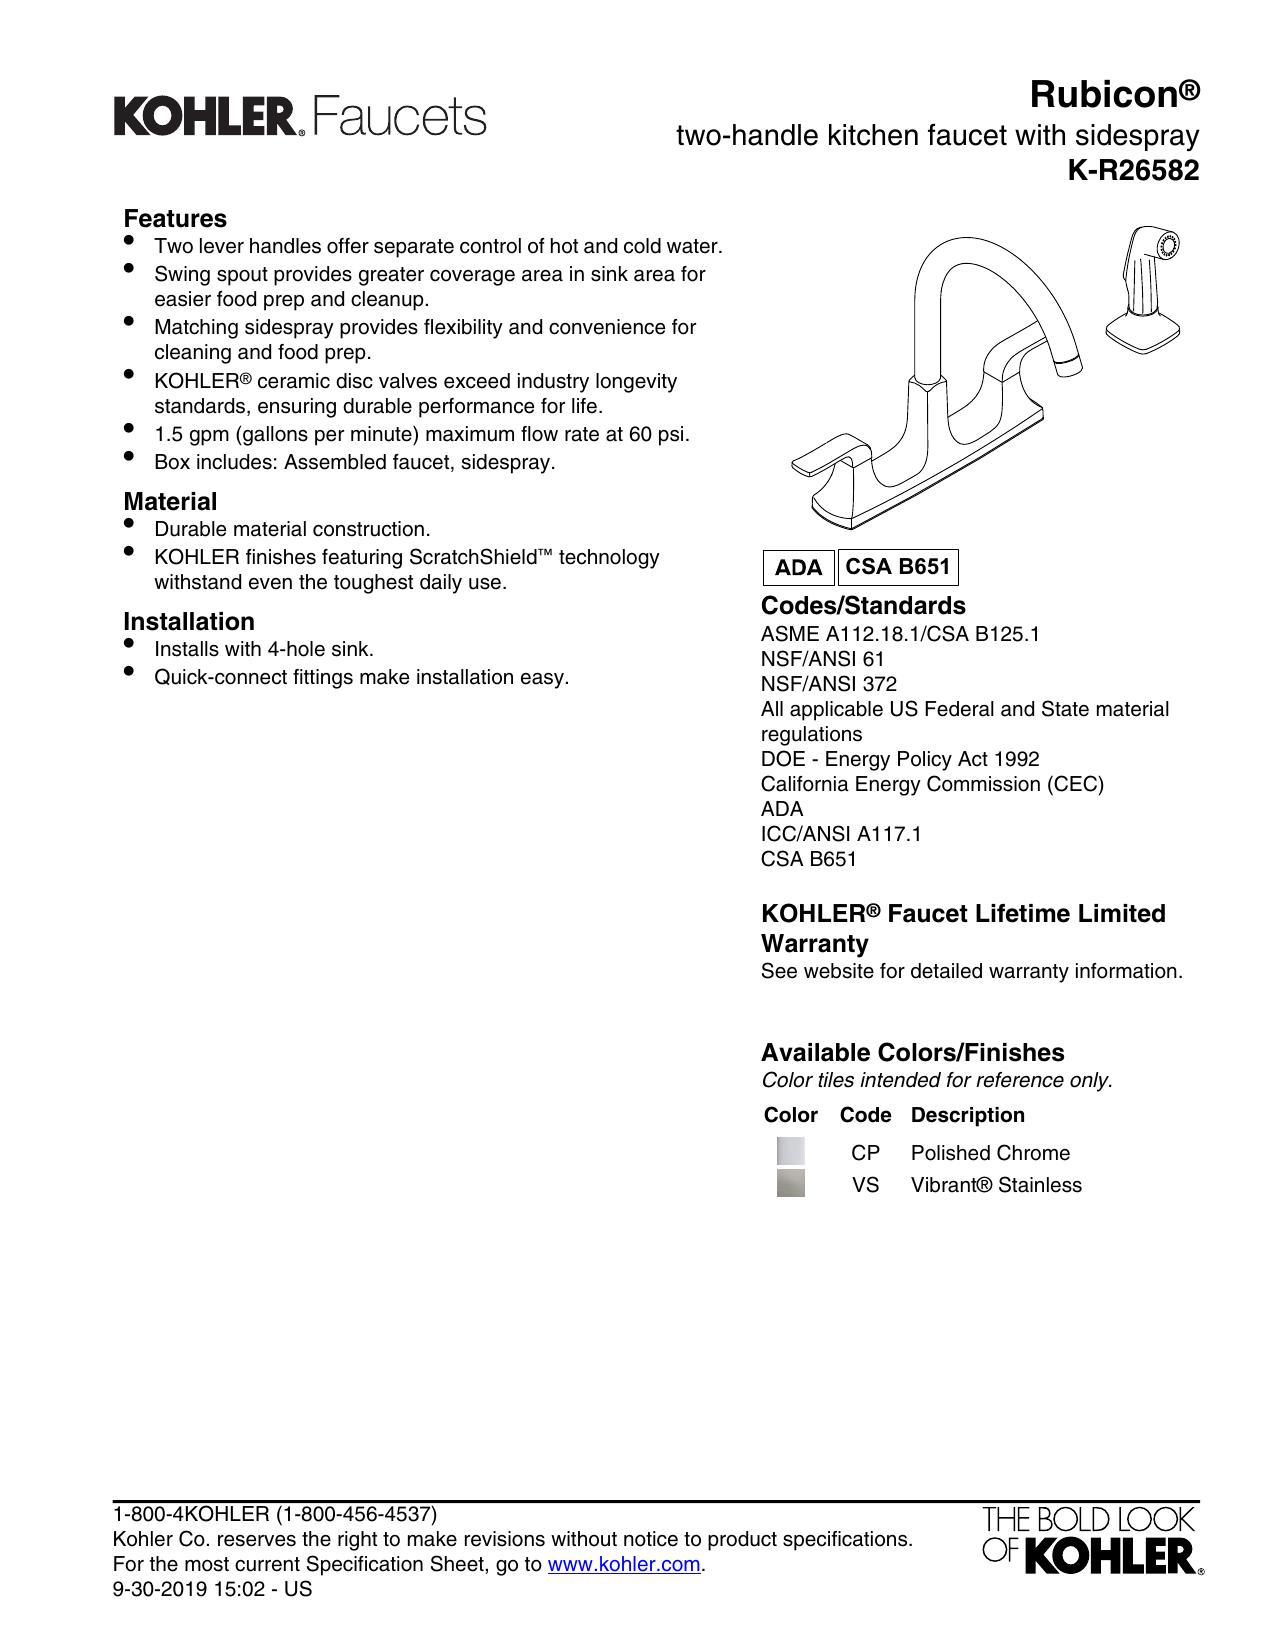 Kohler K R26582 Vs Specification Manualzz